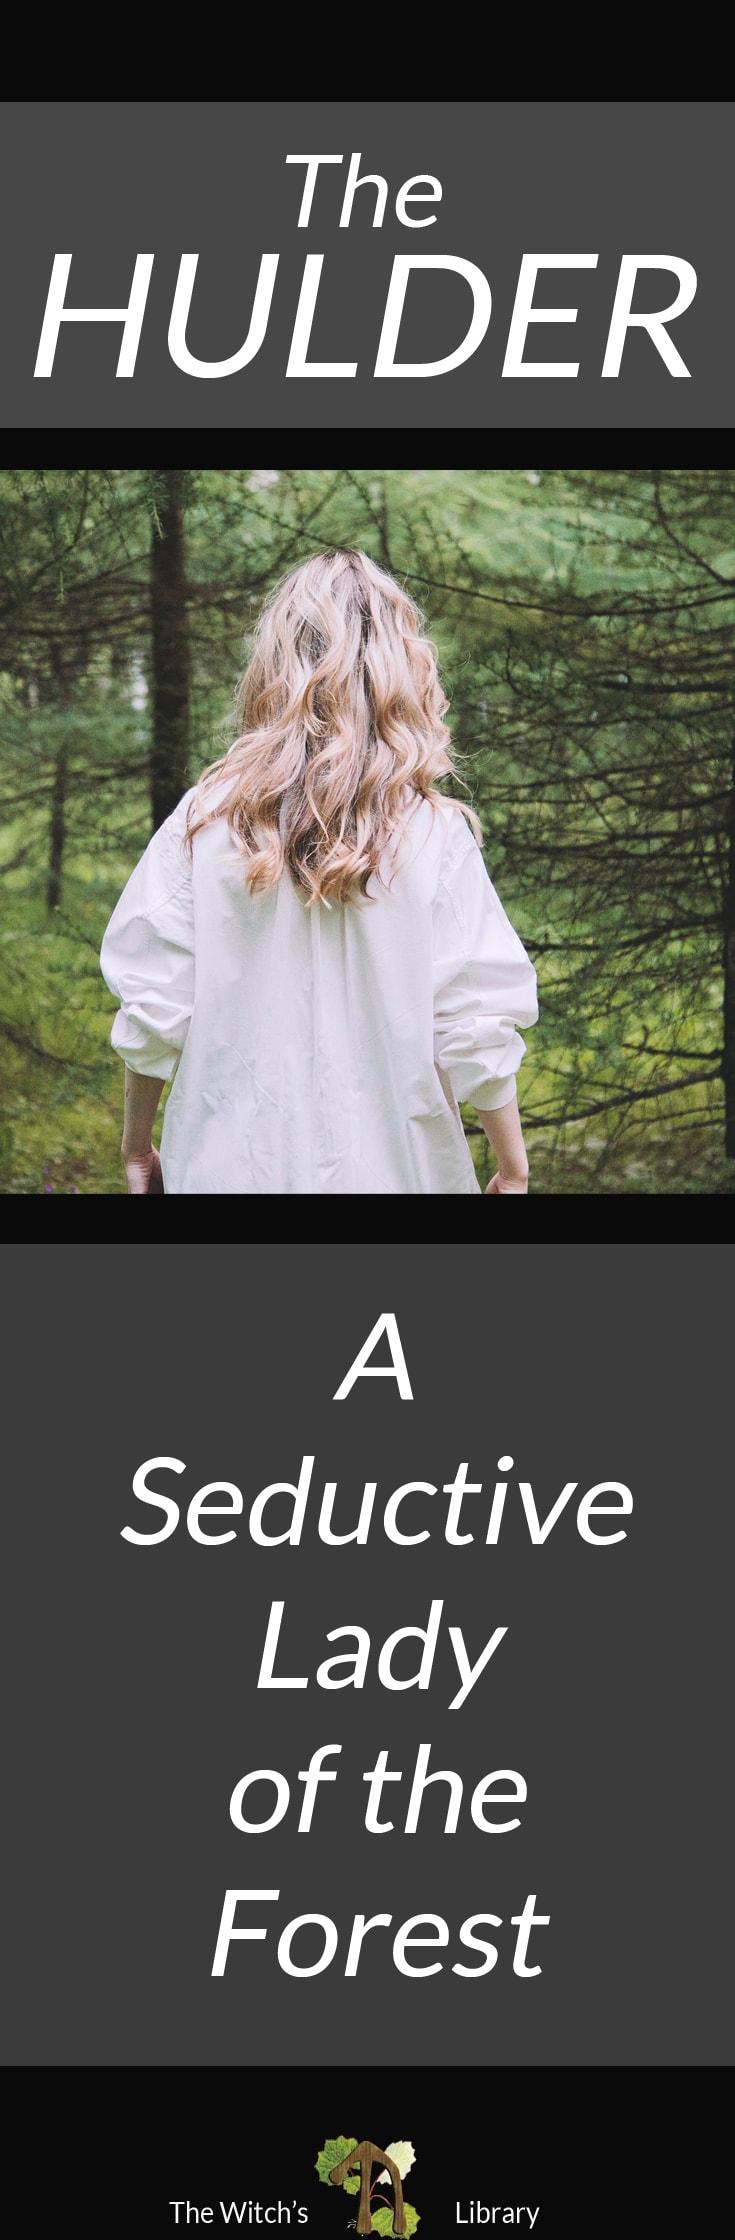 The Hulder - Seductive Lady of Scandinavian Folklore